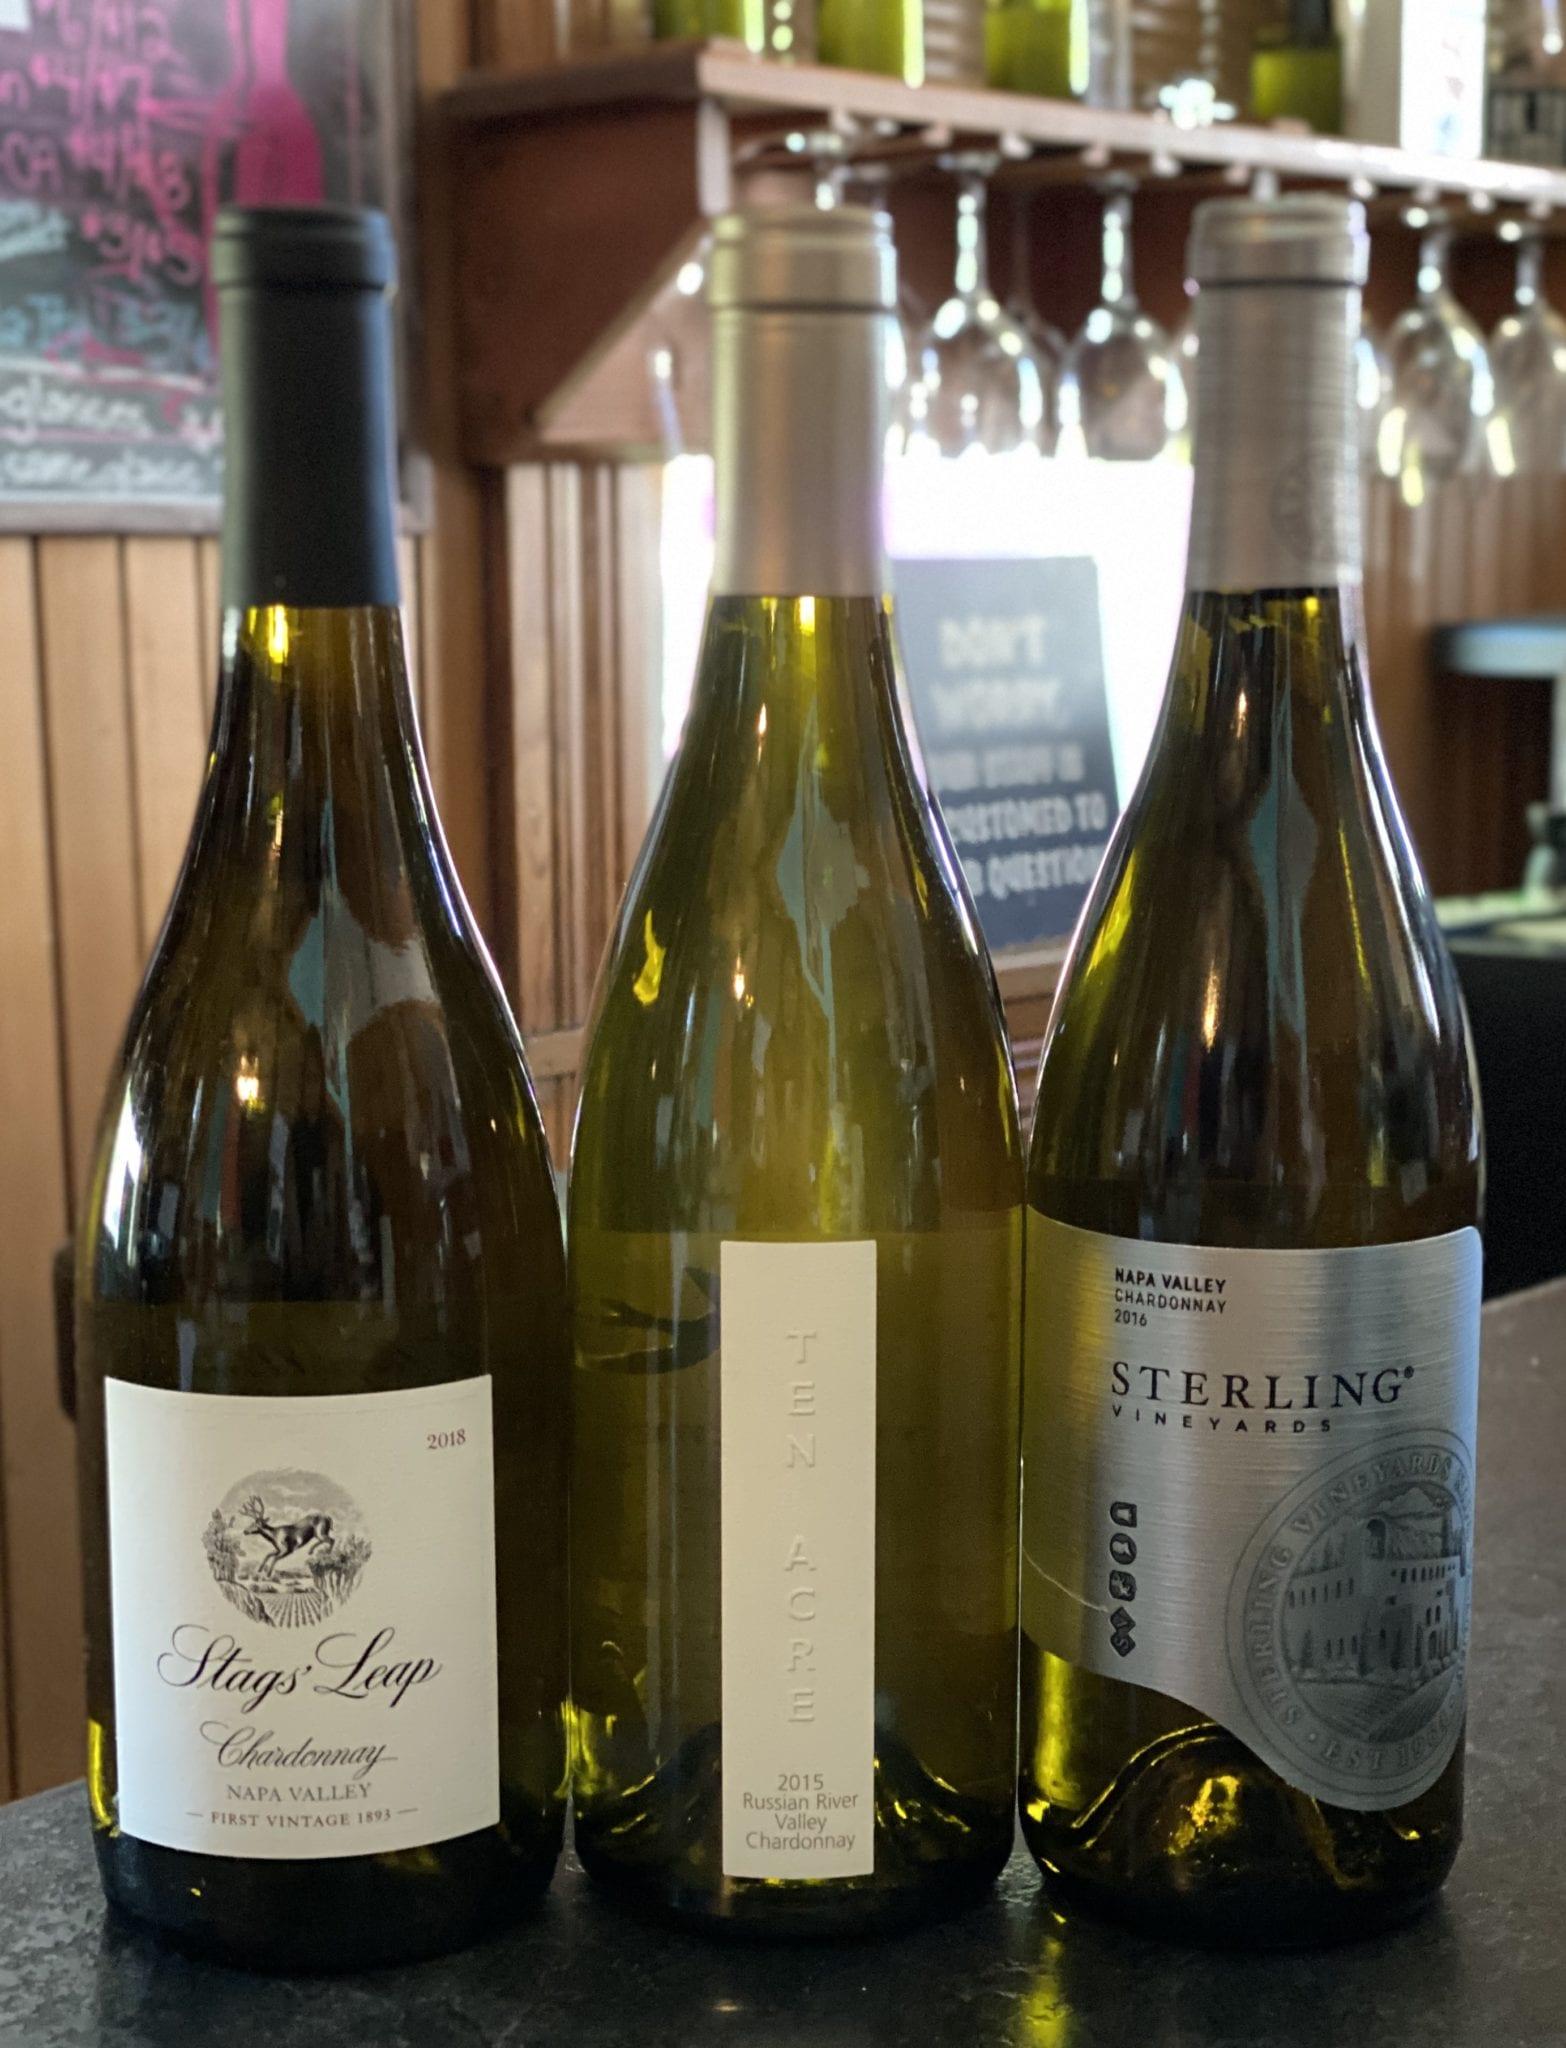 Classic Napa & Sonoma Chardonnay Tasting Trio